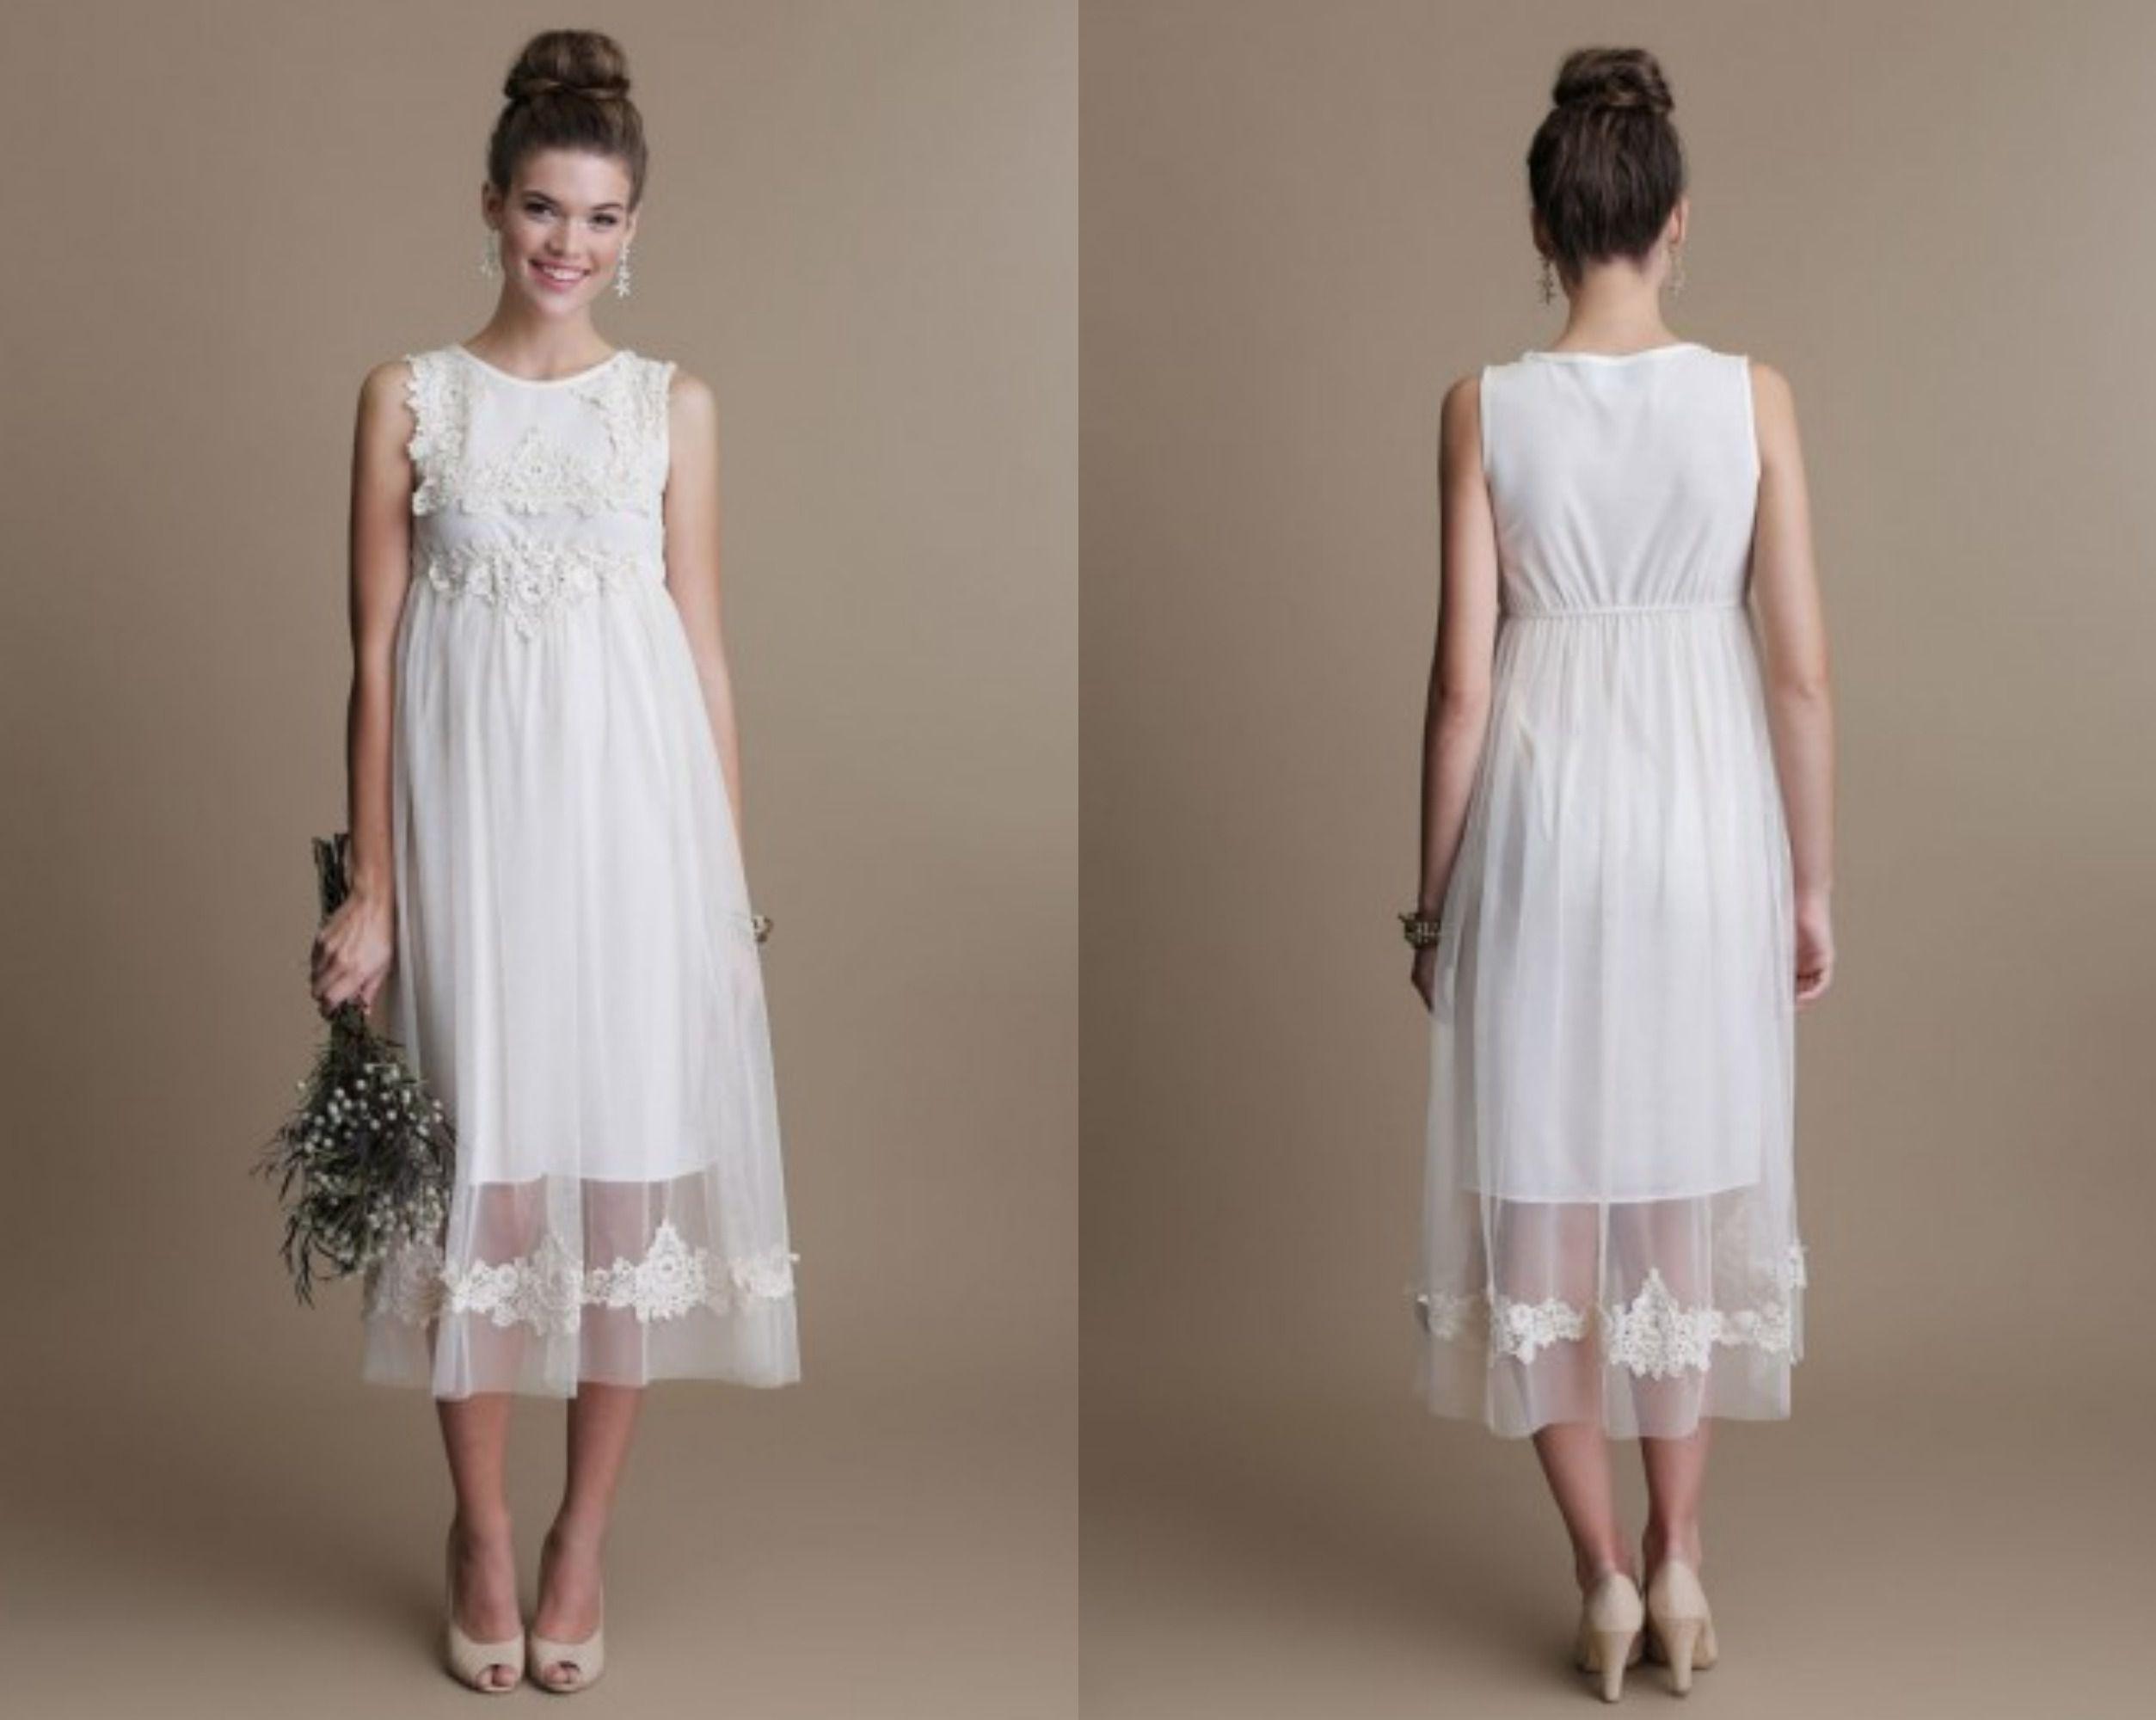 Boho Style Wedding Gowns - Rustic Wedding Chic